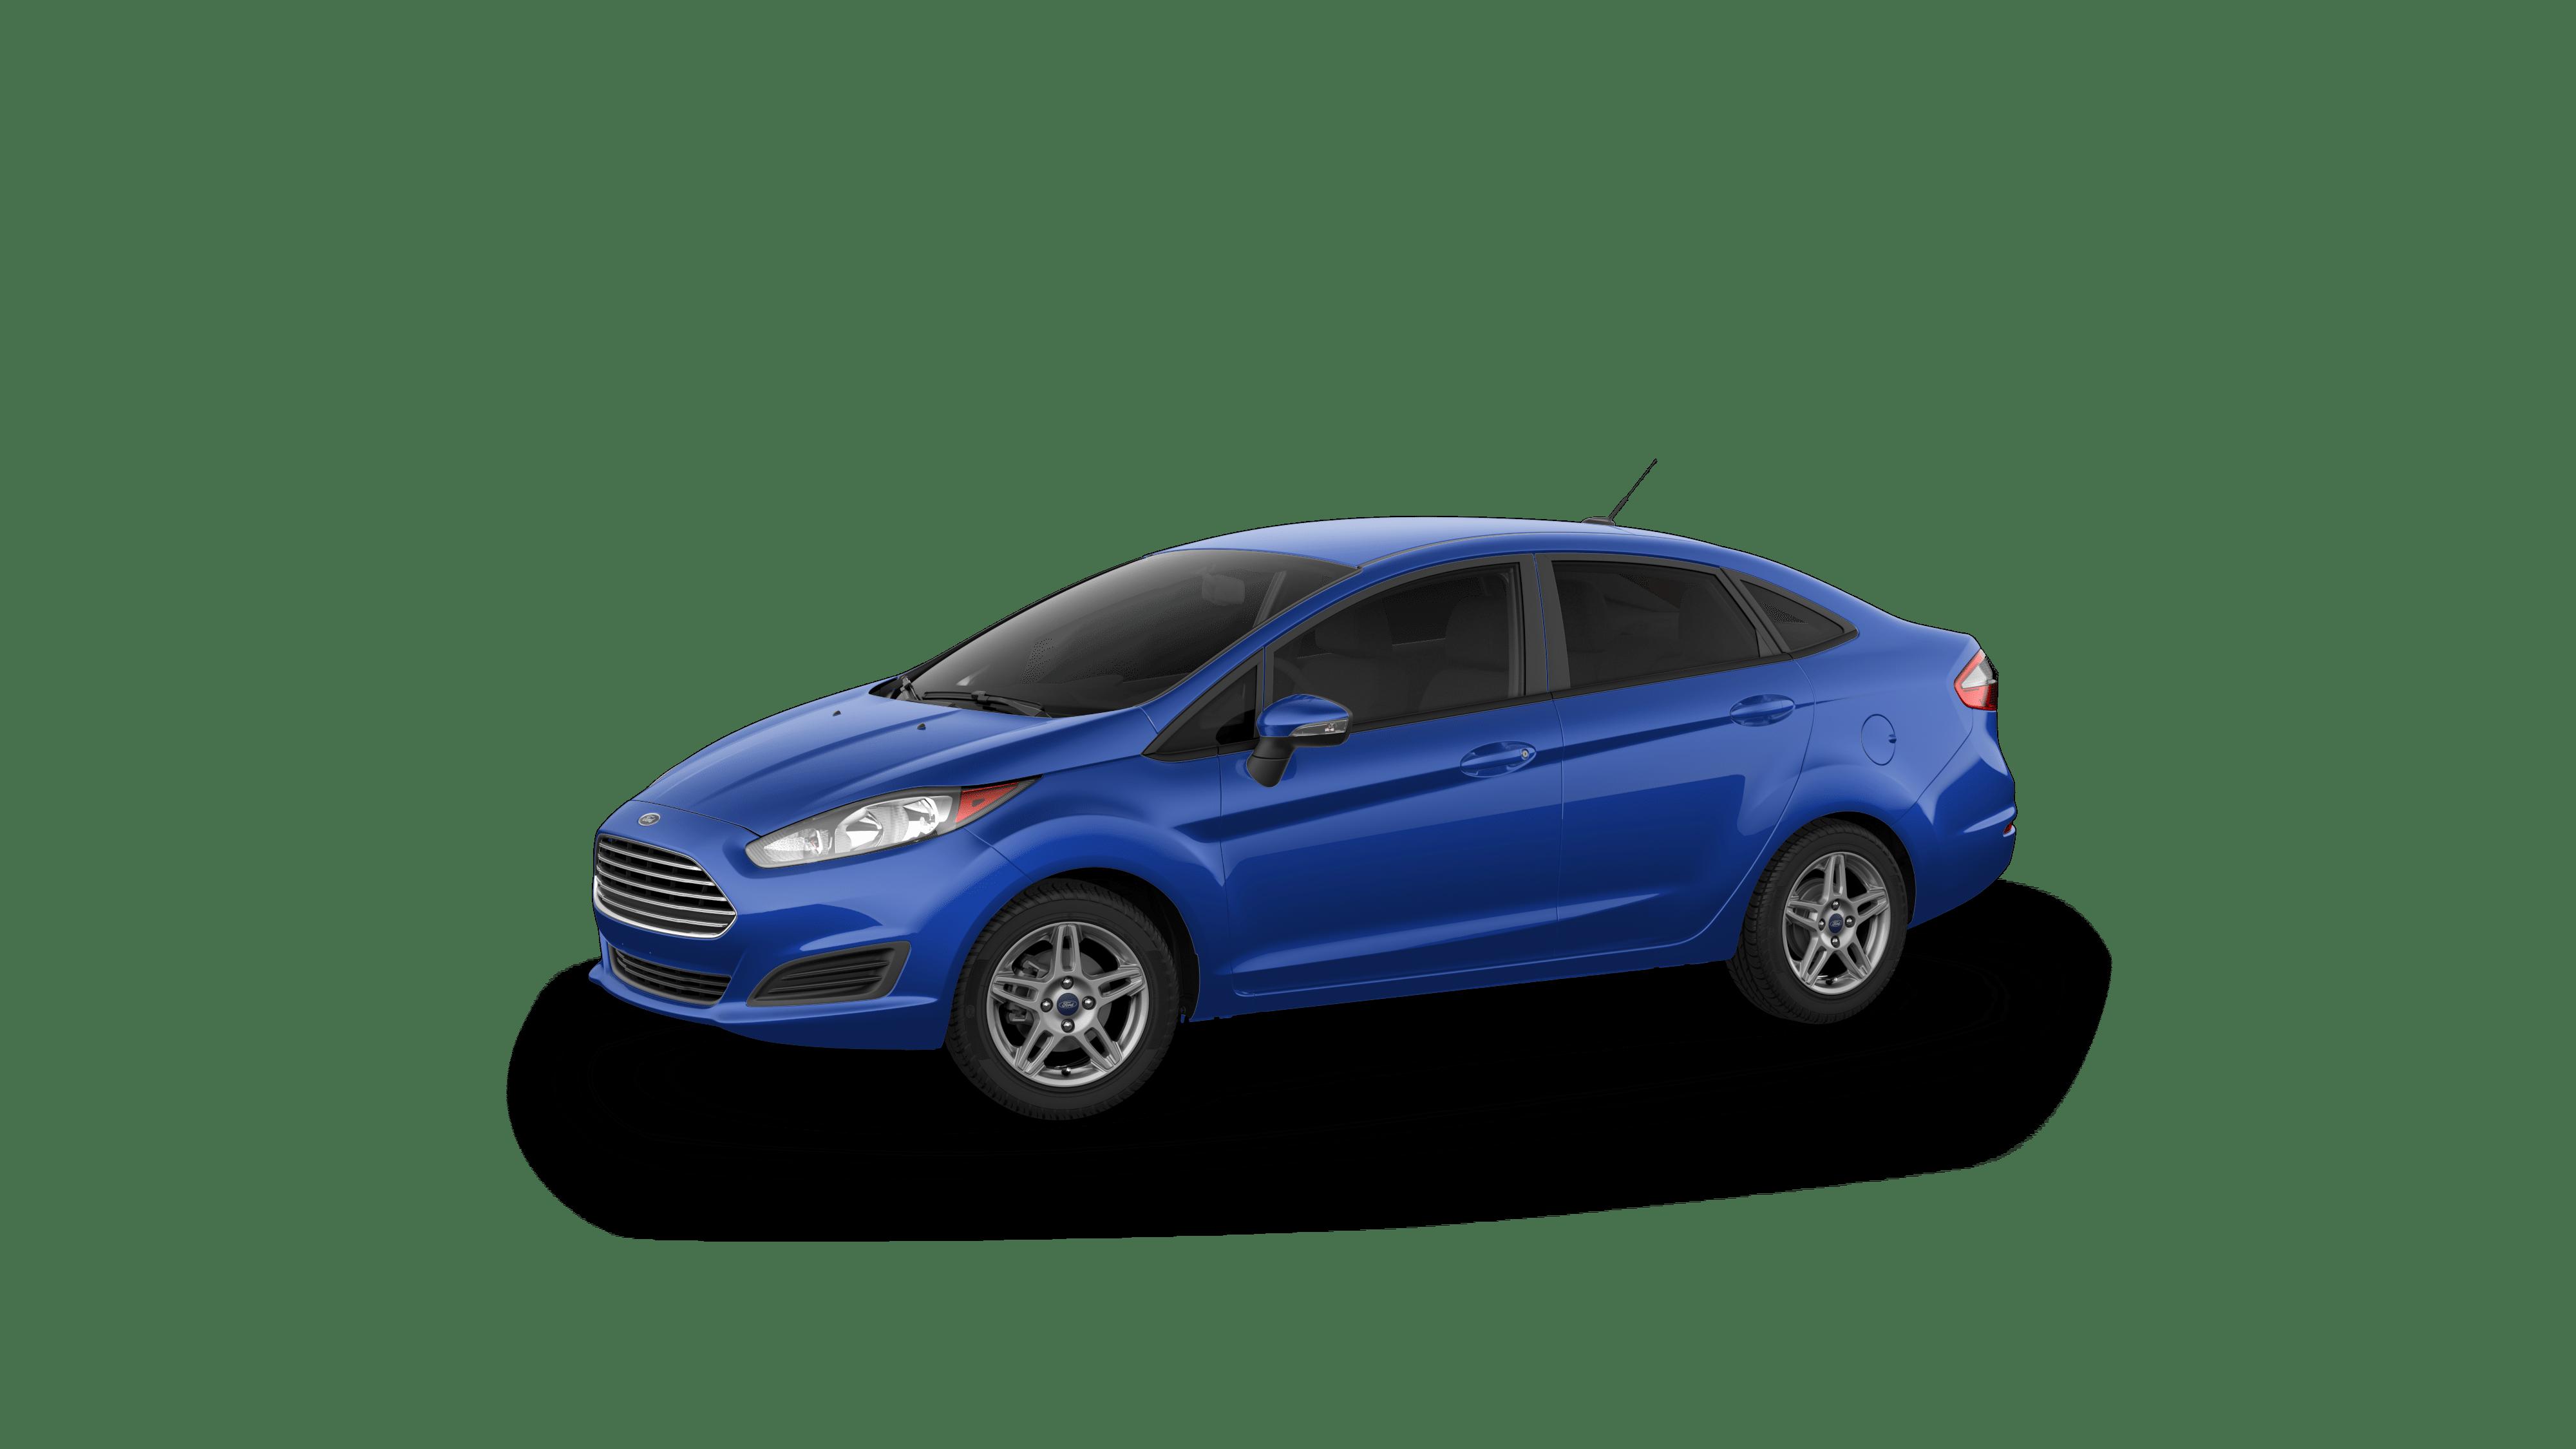 Ciocca Ford Quakertown >> New 2019 Ford Fiesta SE Hatch For Sale in Quakertown, PA   KM119188